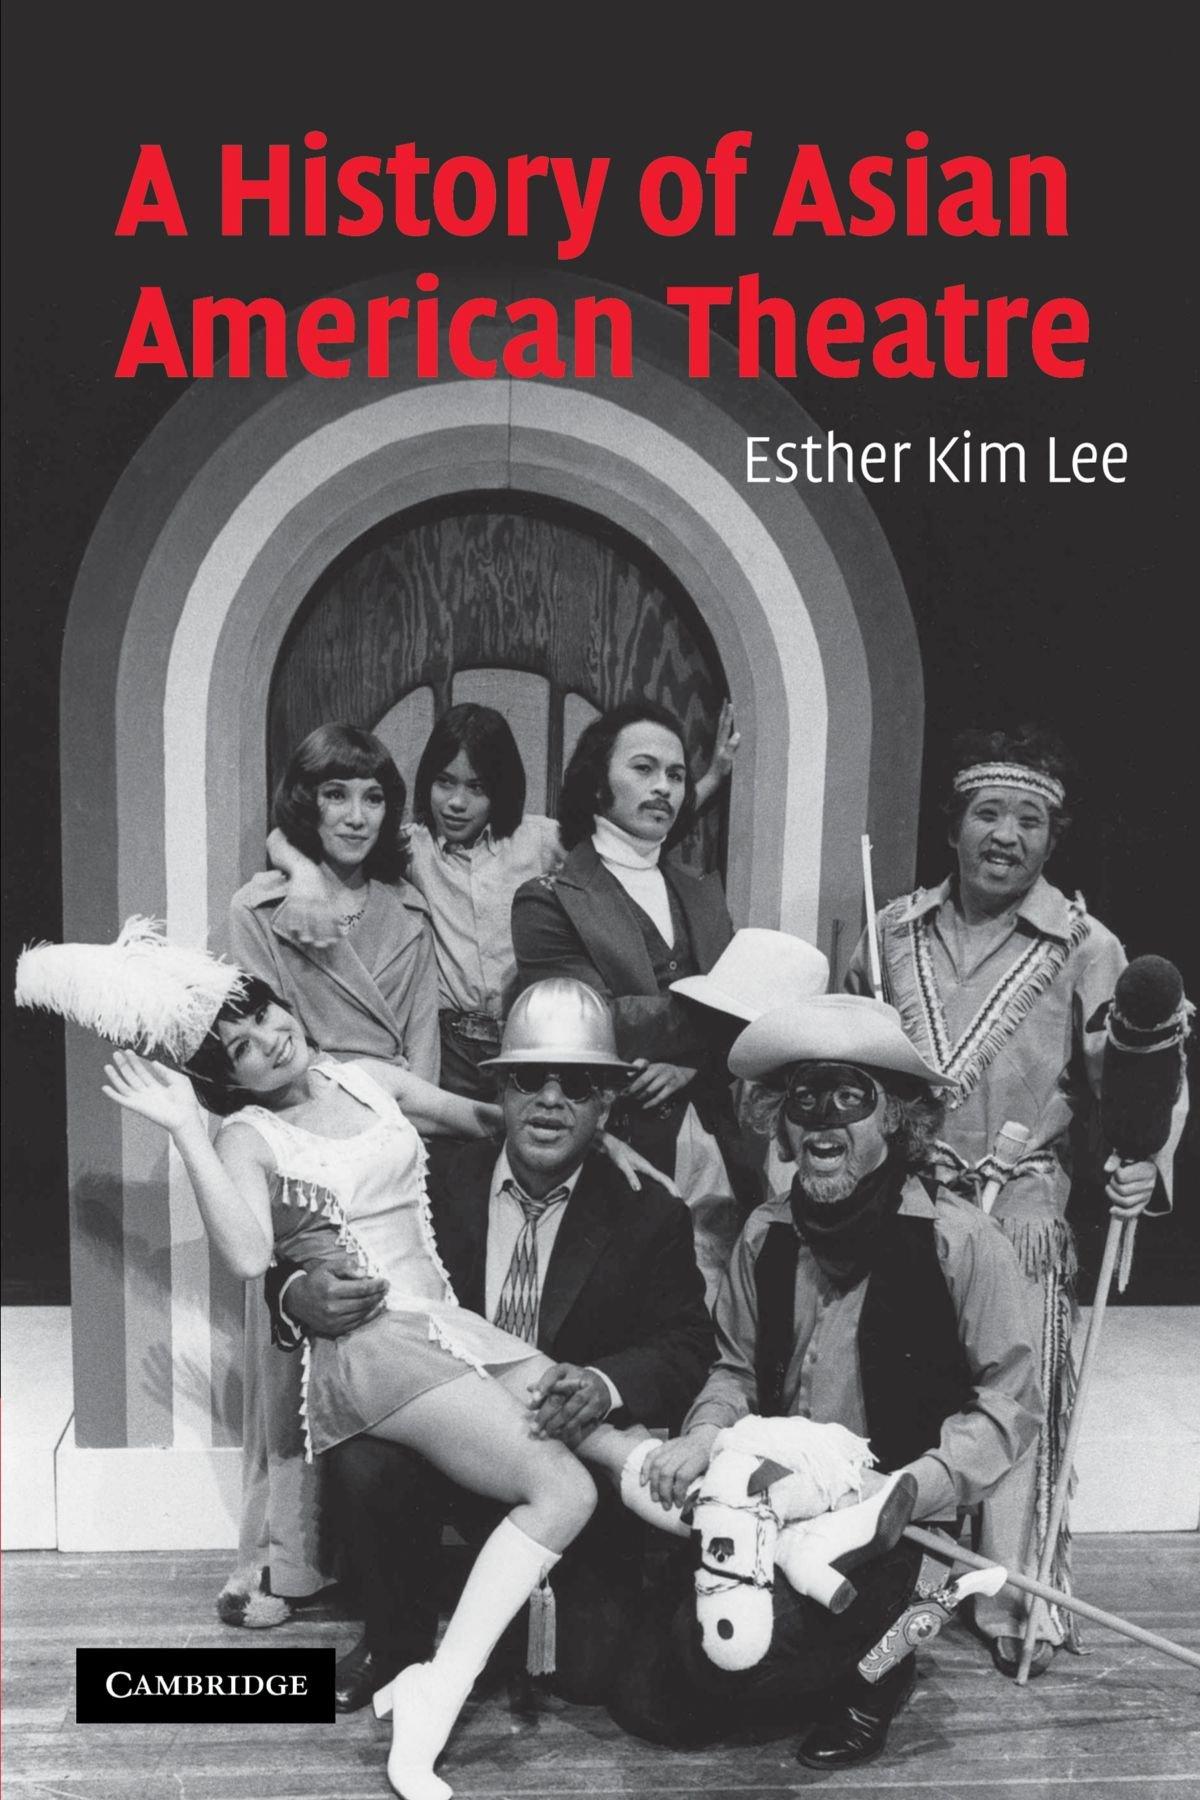 A History of Asian American Theatre (Cambridge Studies in American Theatre and Drama) pdf